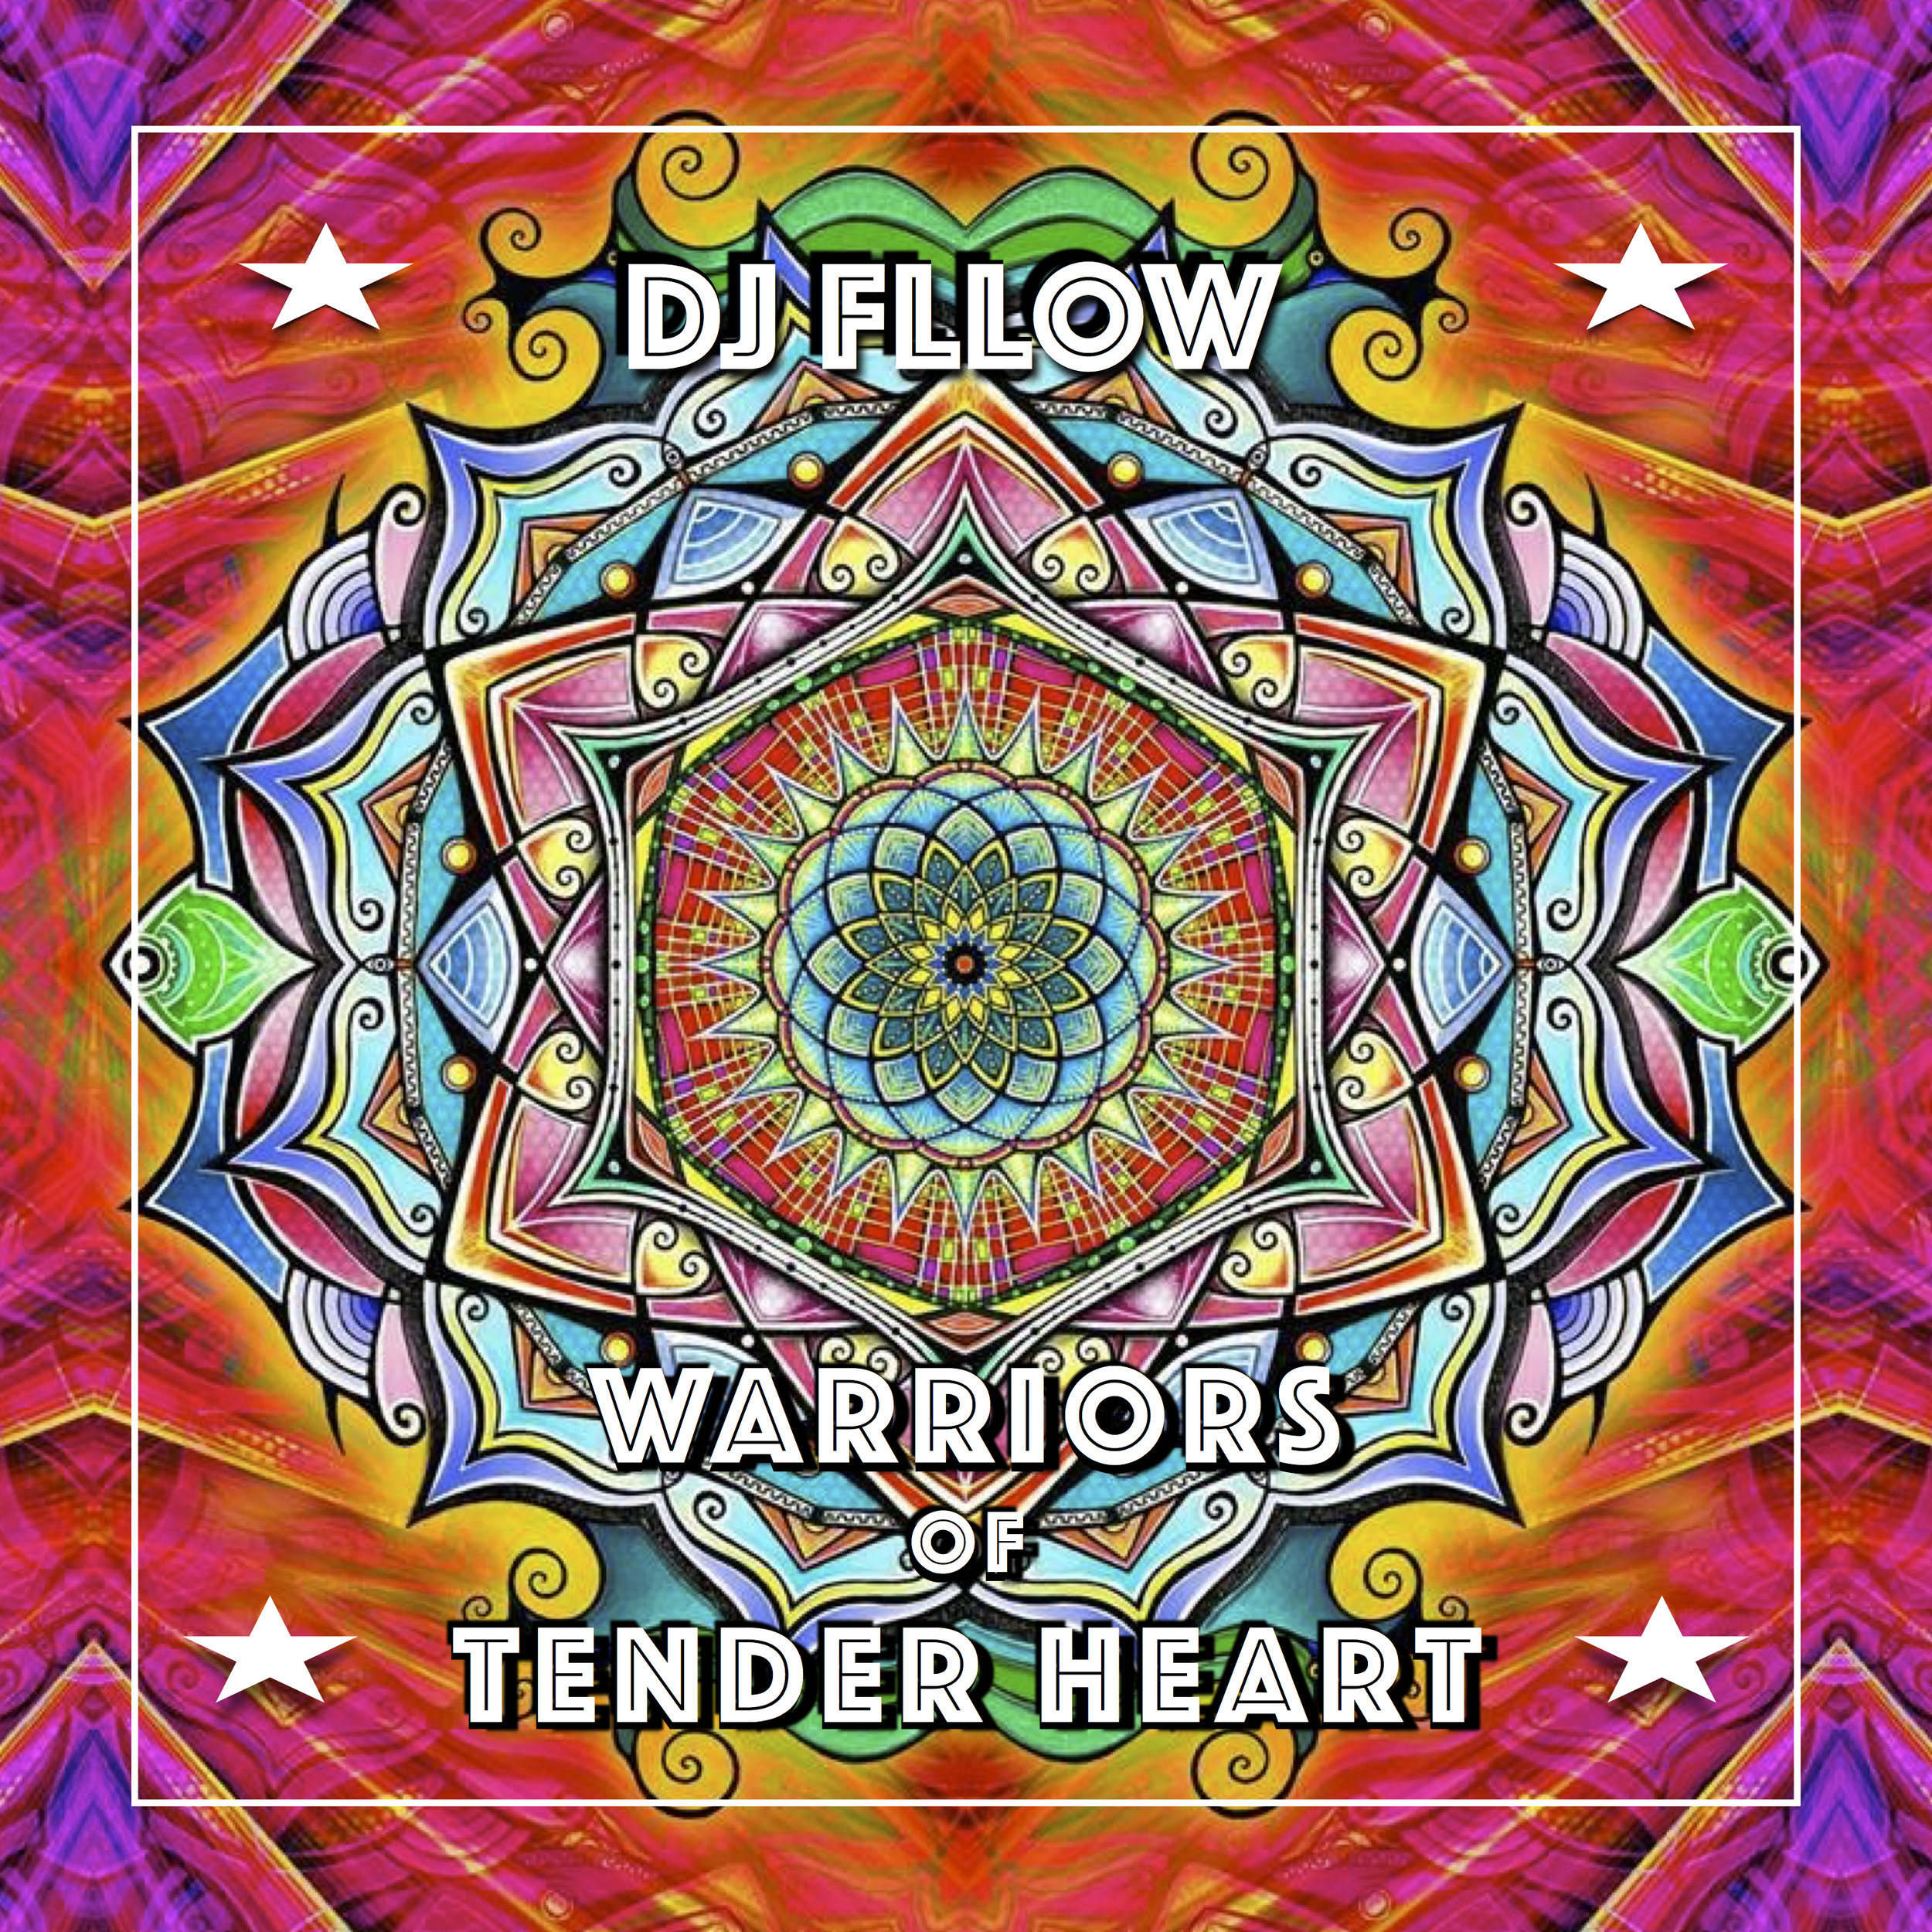 DJ FLLOW WARRIORS ALBUM COVER.jpg